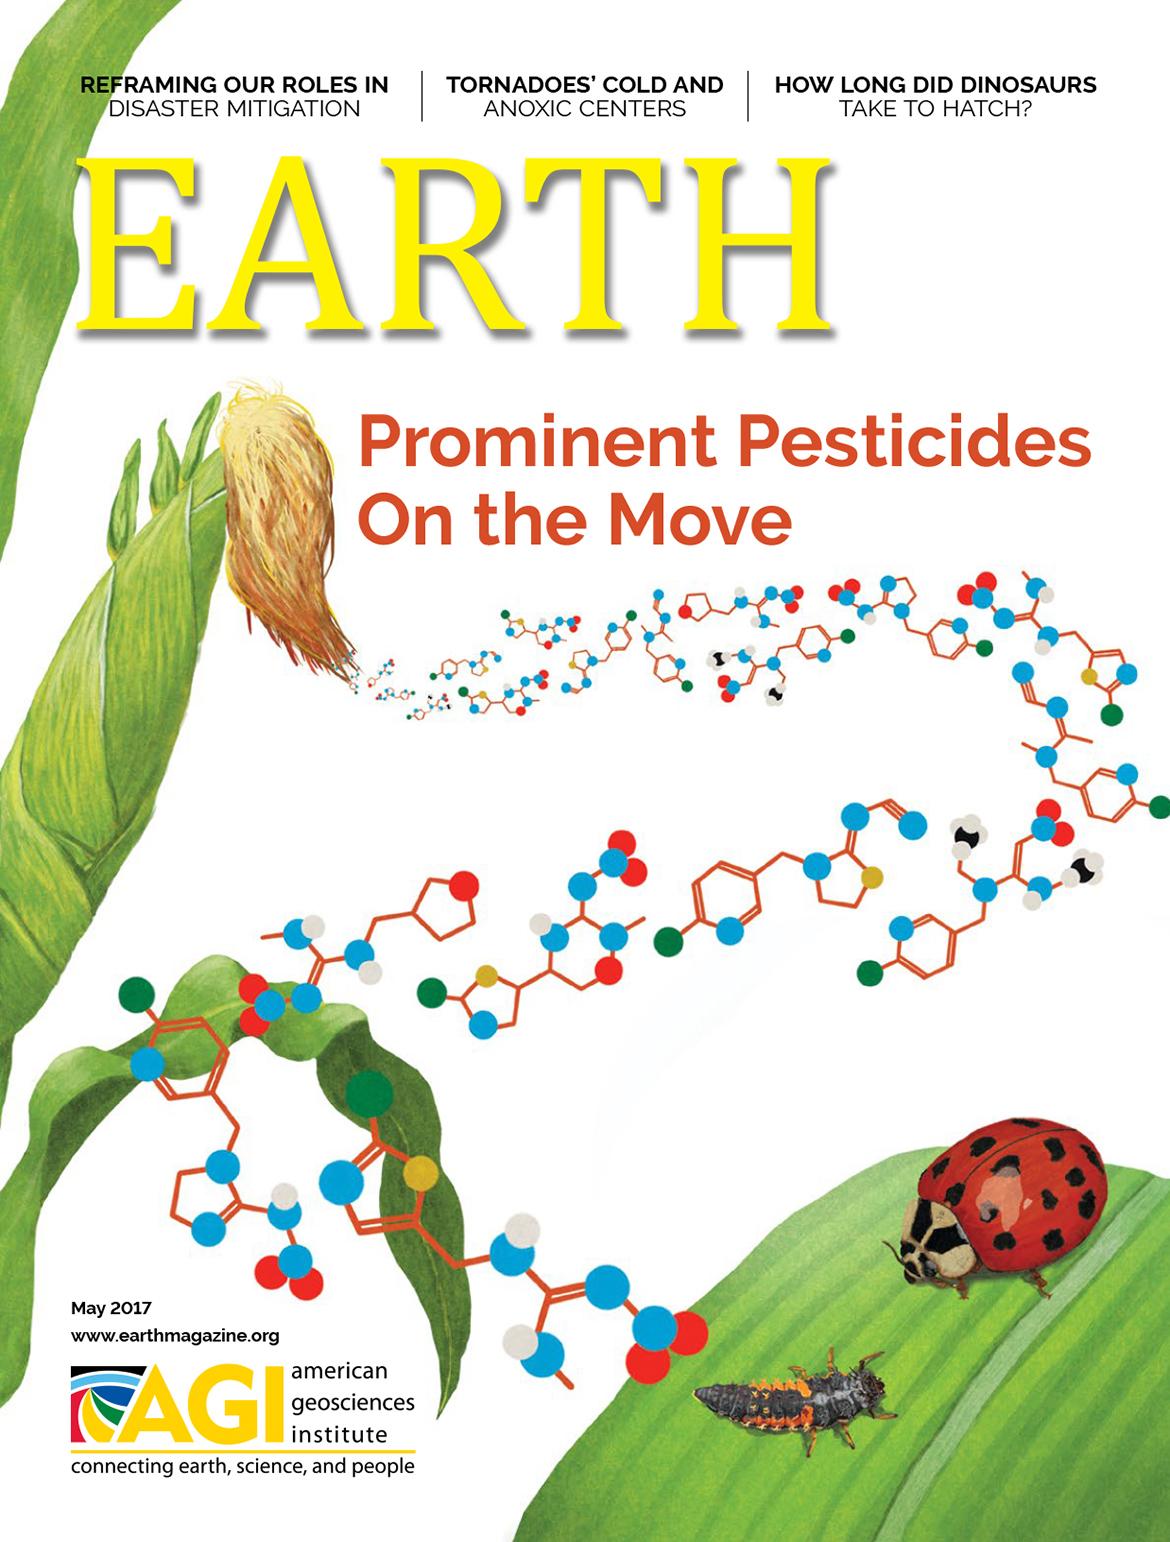 May 2017  EARTH Magazine,layout by Nicole Schmidgall  www.nicoleschmidgall.com